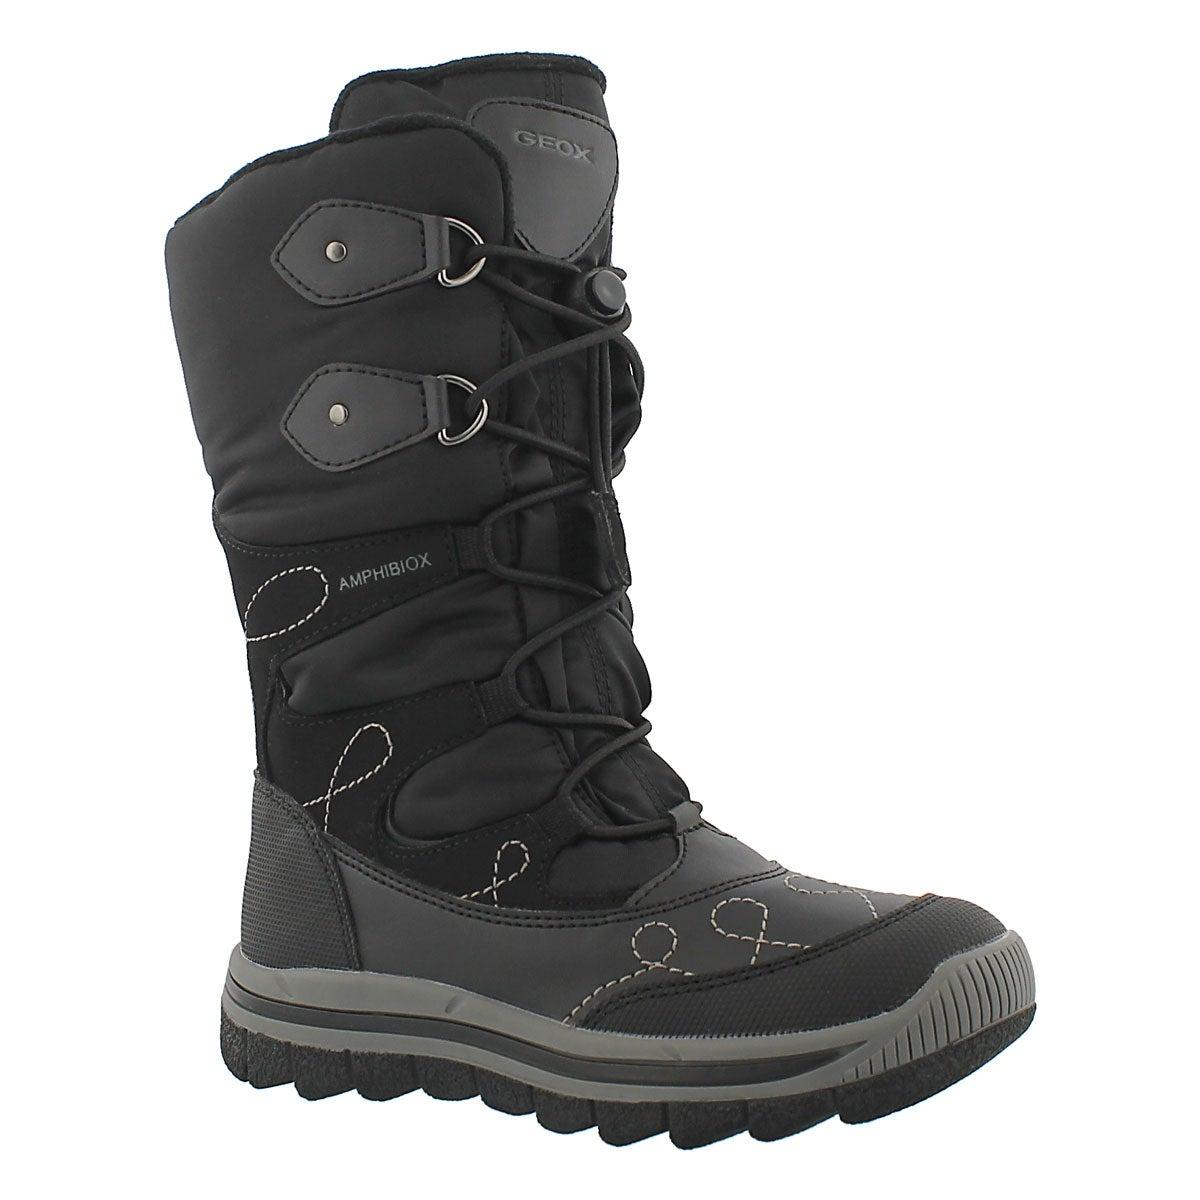 Girls Overland black lined winter boot